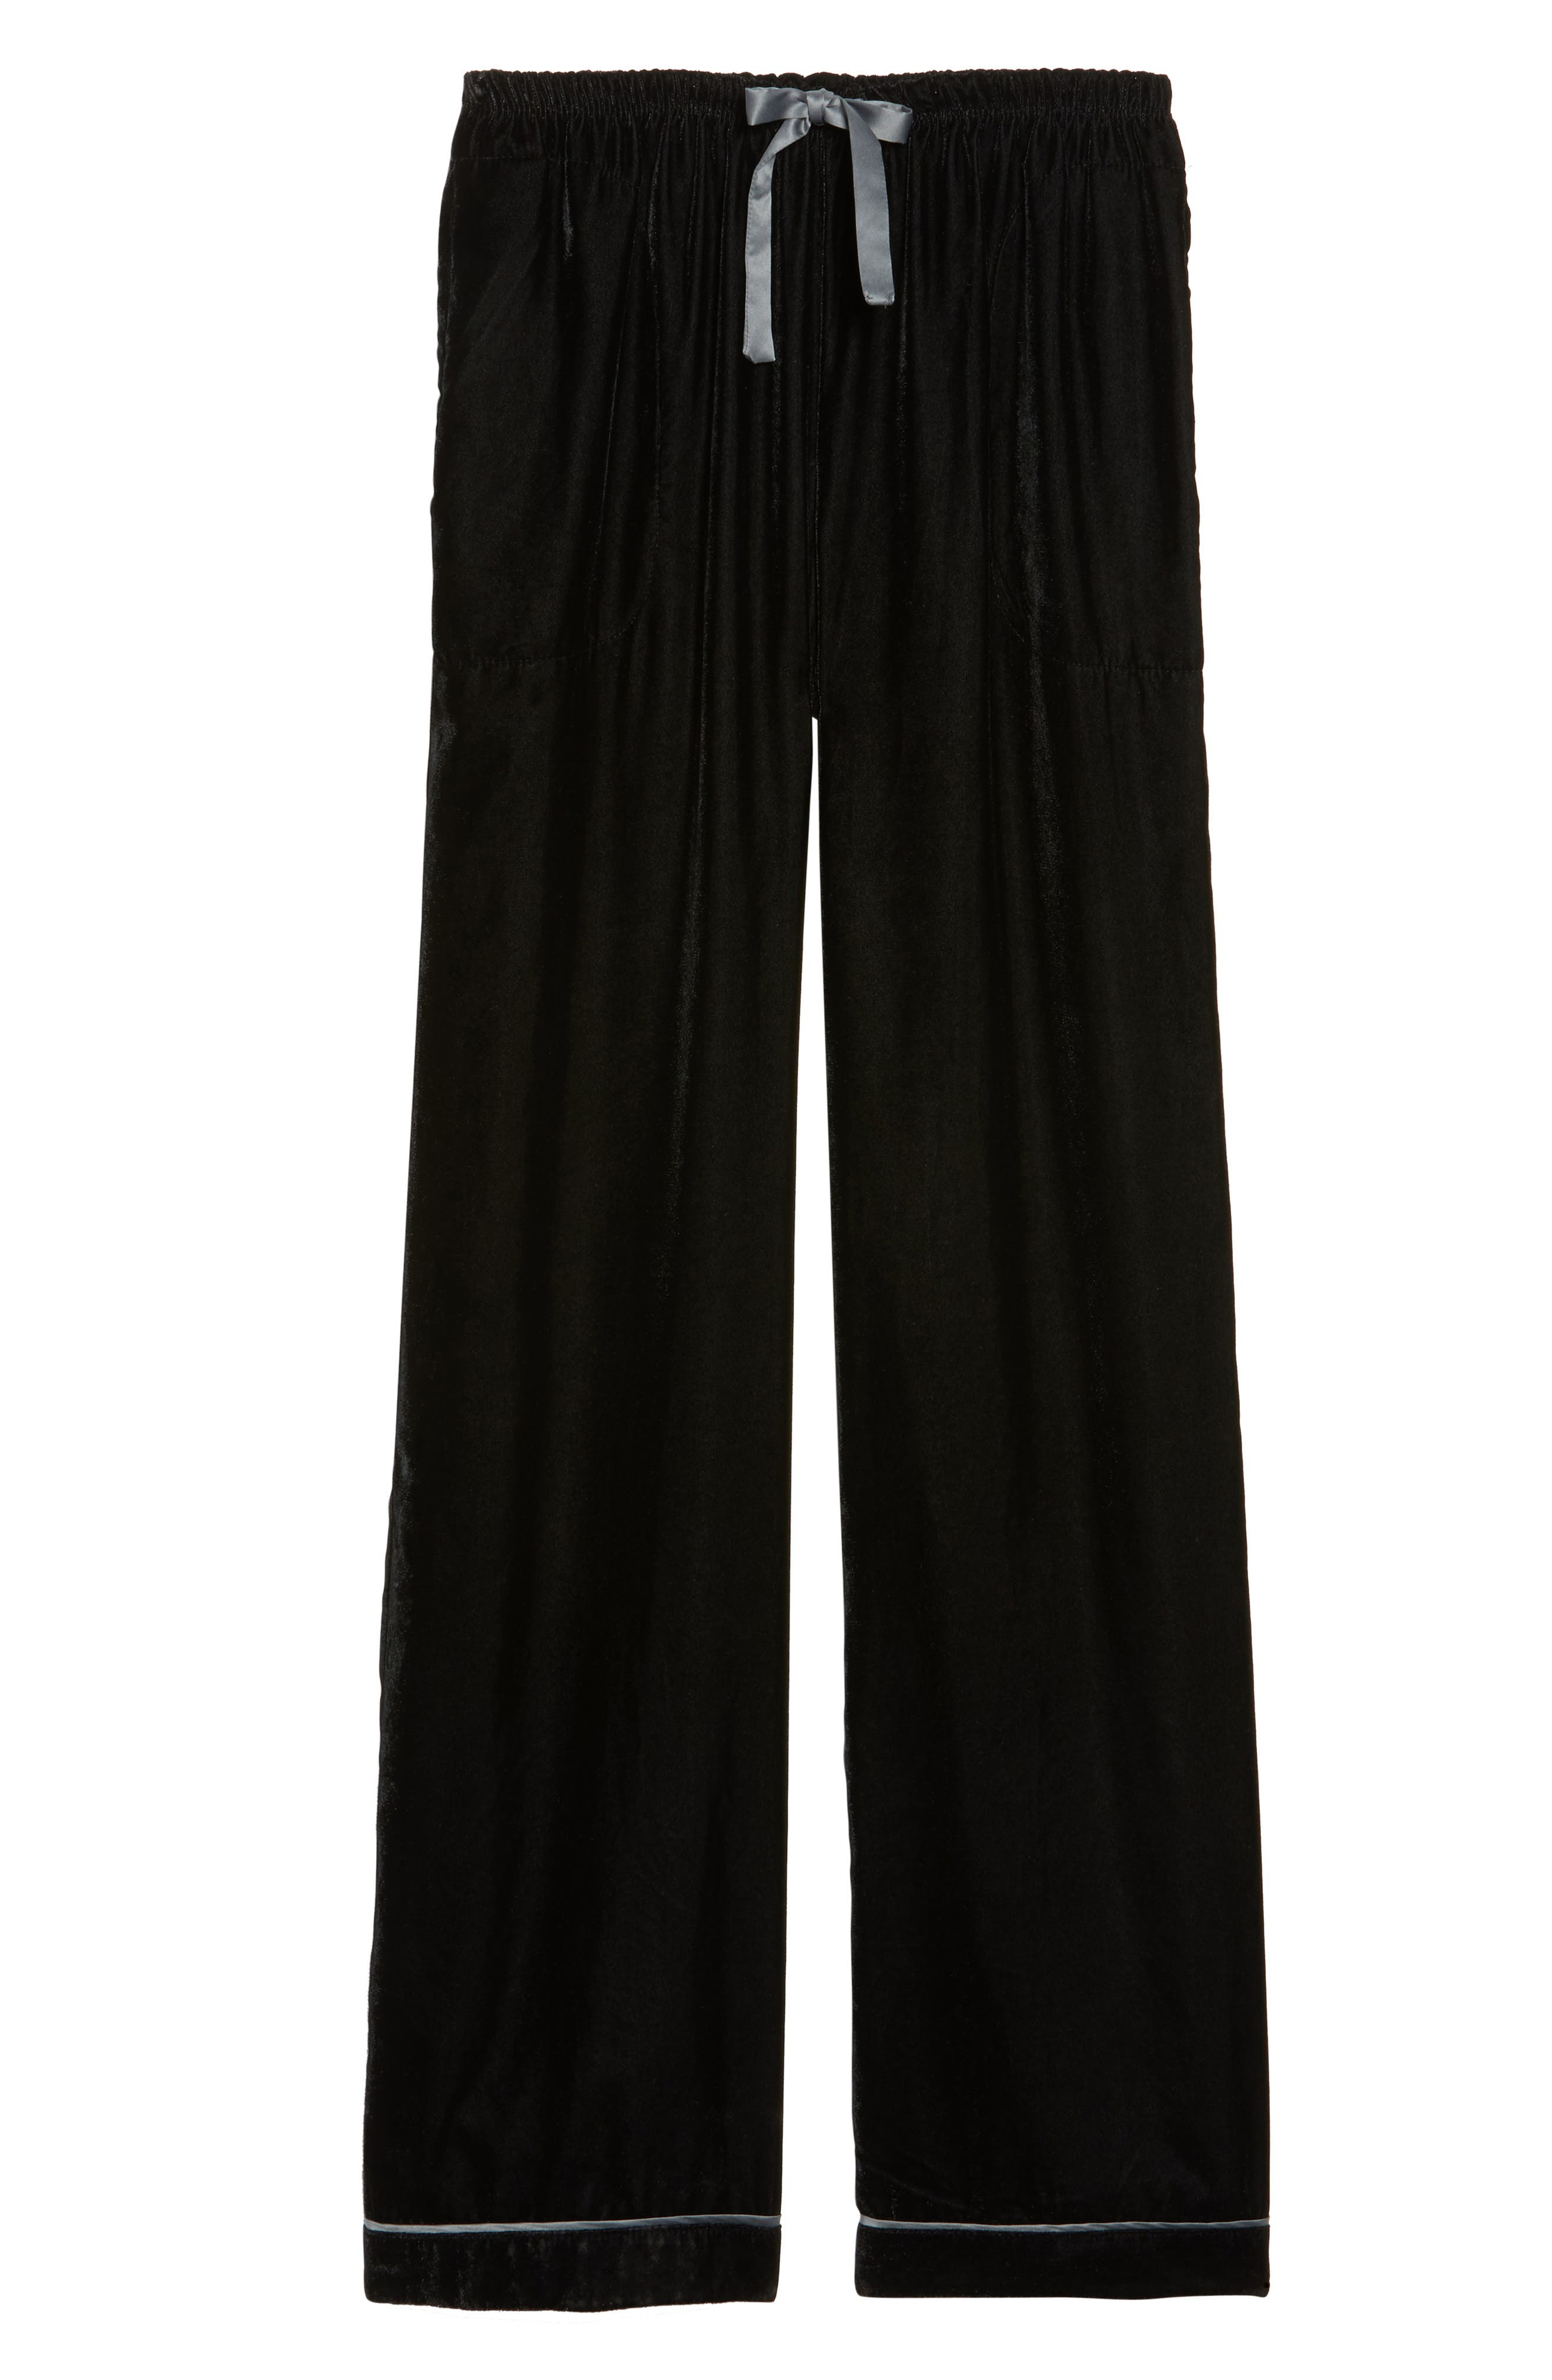 Velvet Pajama Pants,                             Alternate thumbnail 6, color,                             001